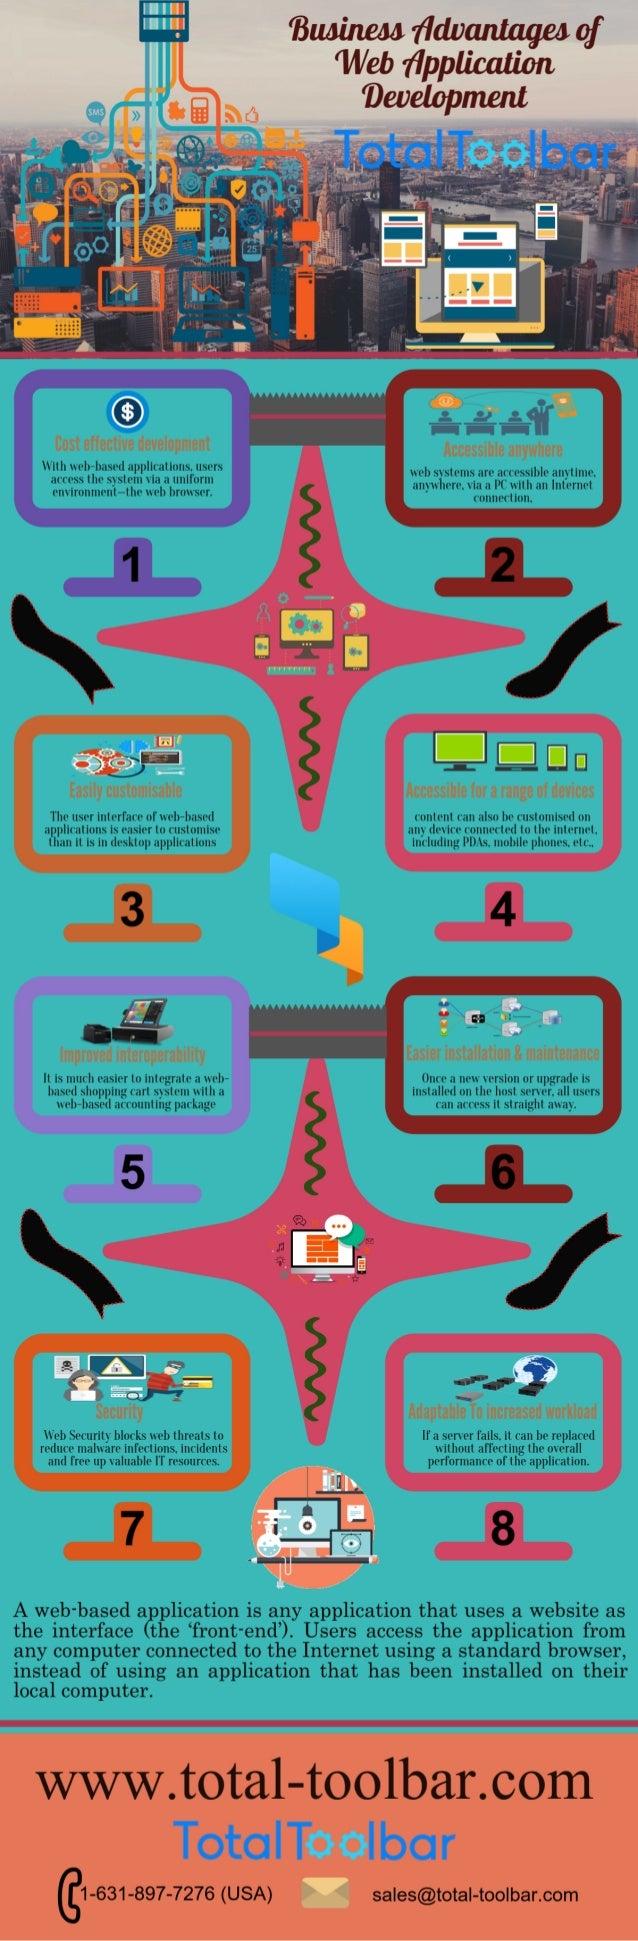 Term paper on management information system image 5